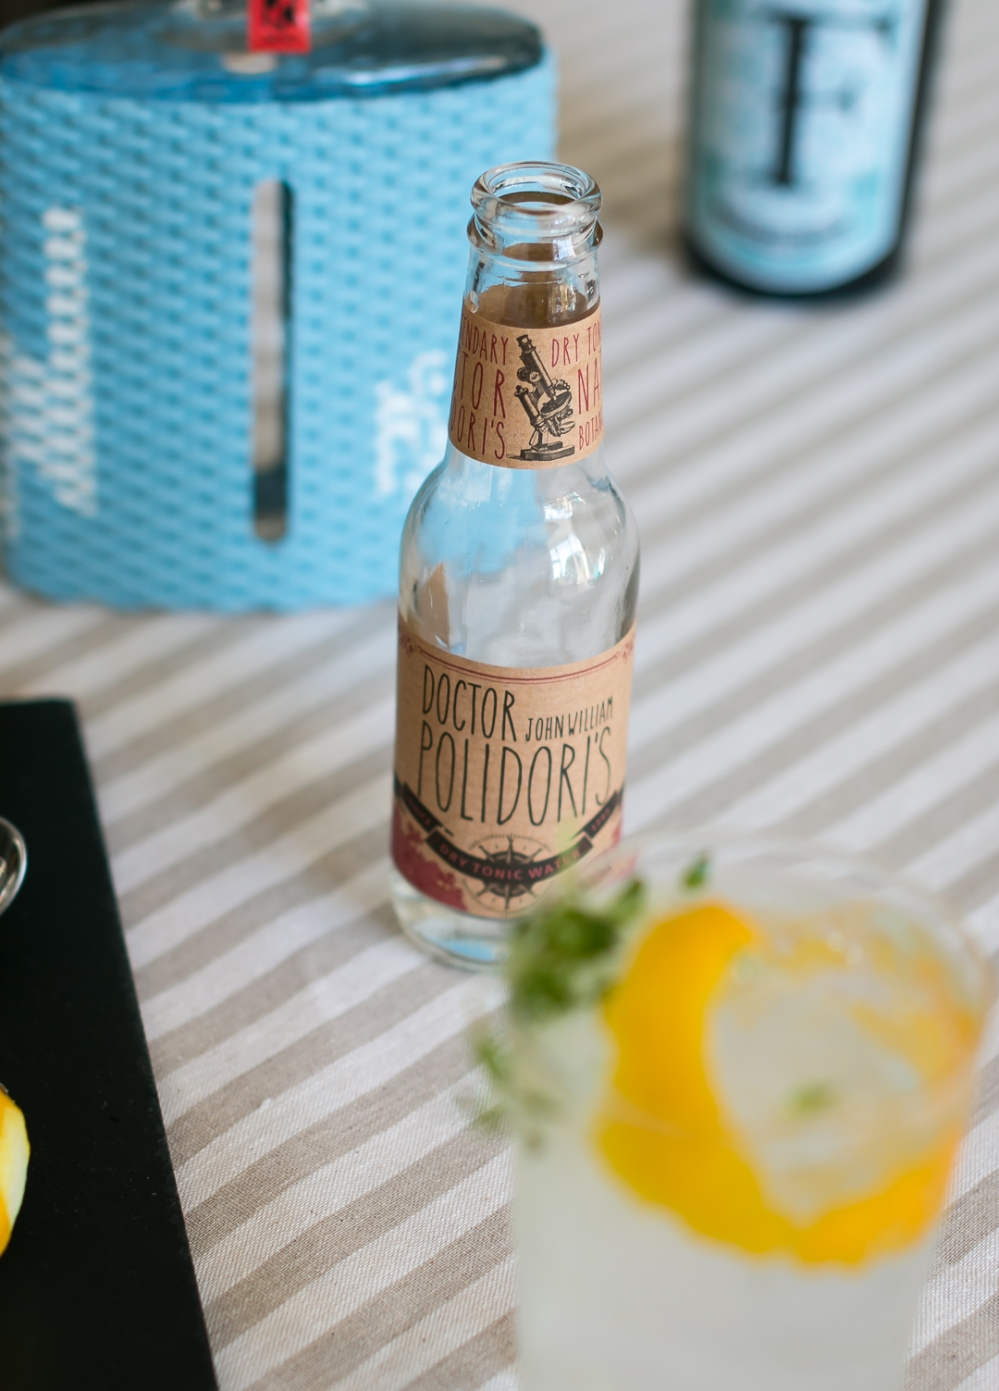 Gin and Tonic med Ferdinand's Saar Dry Gin og Doctor Polidoris Tonic. Photo by Michael Sperling, En Verden af Gin.